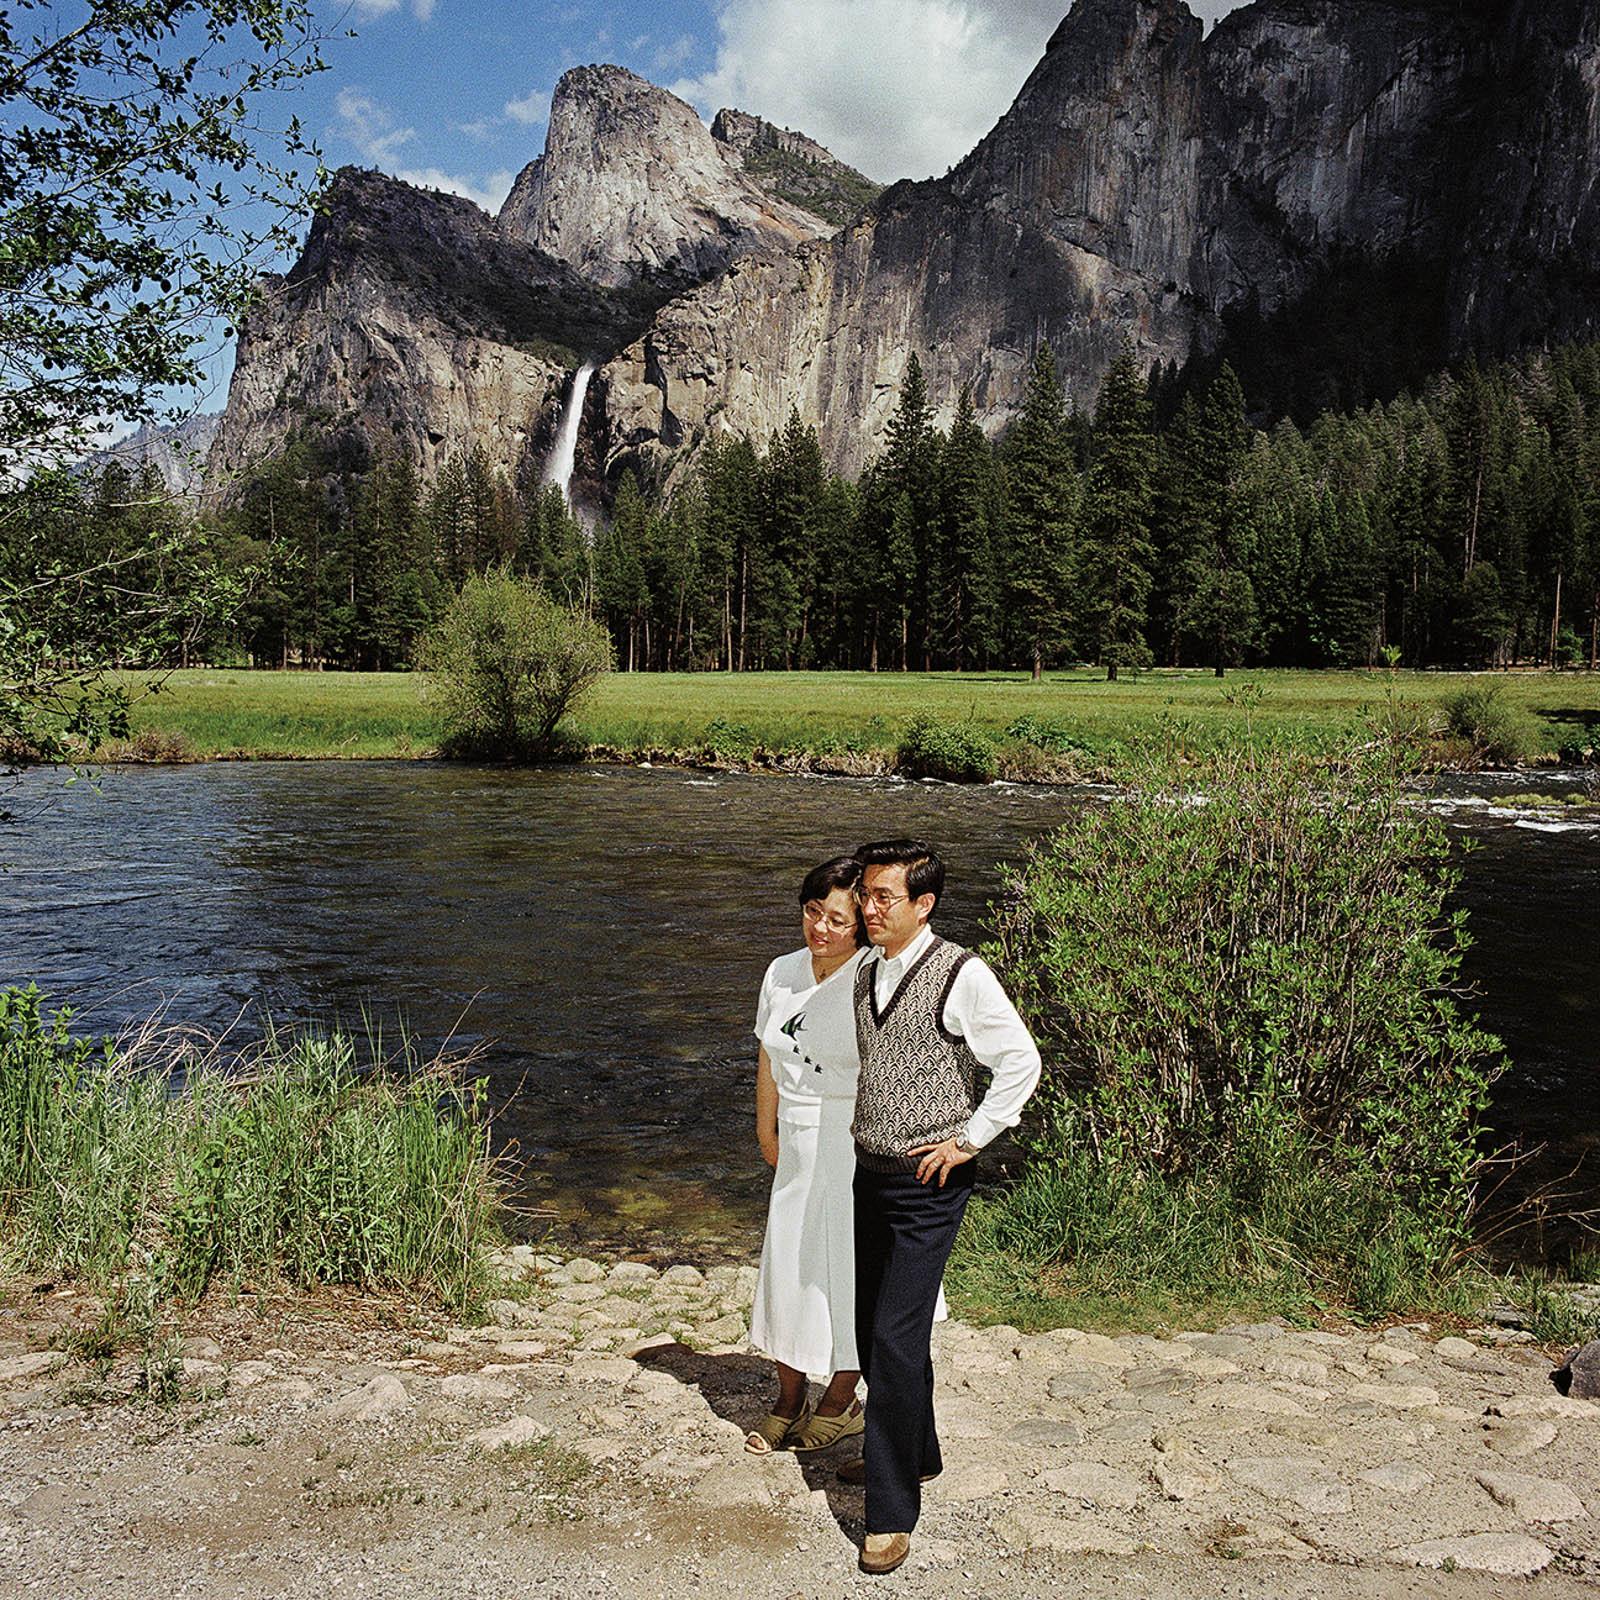 Couple at Bridal Veil Falls, Yosemite National Park, California 1981